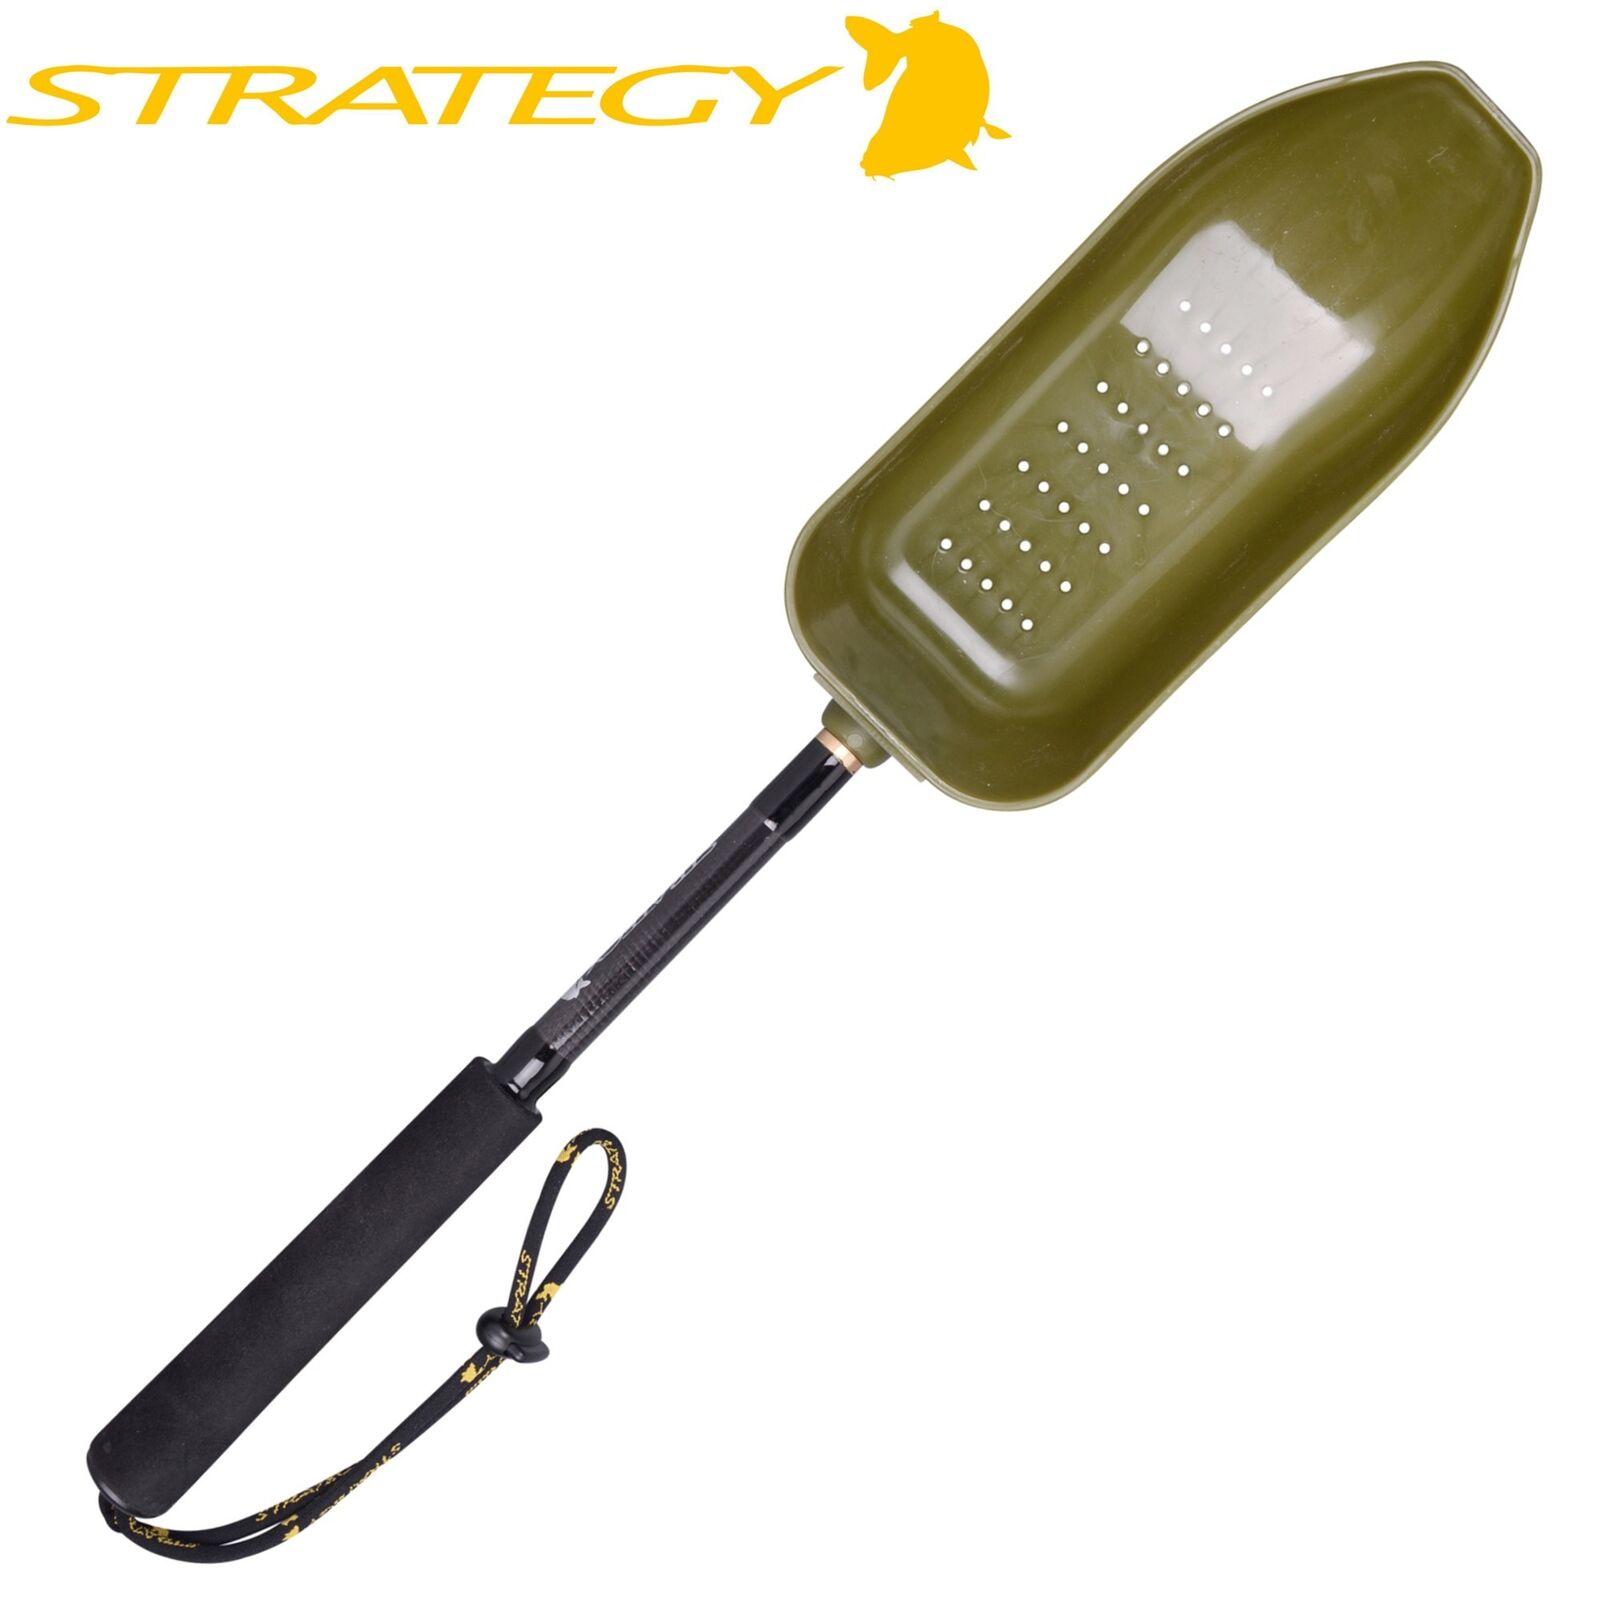 Strategy short Bait Spoon wide with holes-alimentación animal pala, pala, pala, futterkelle db1a33